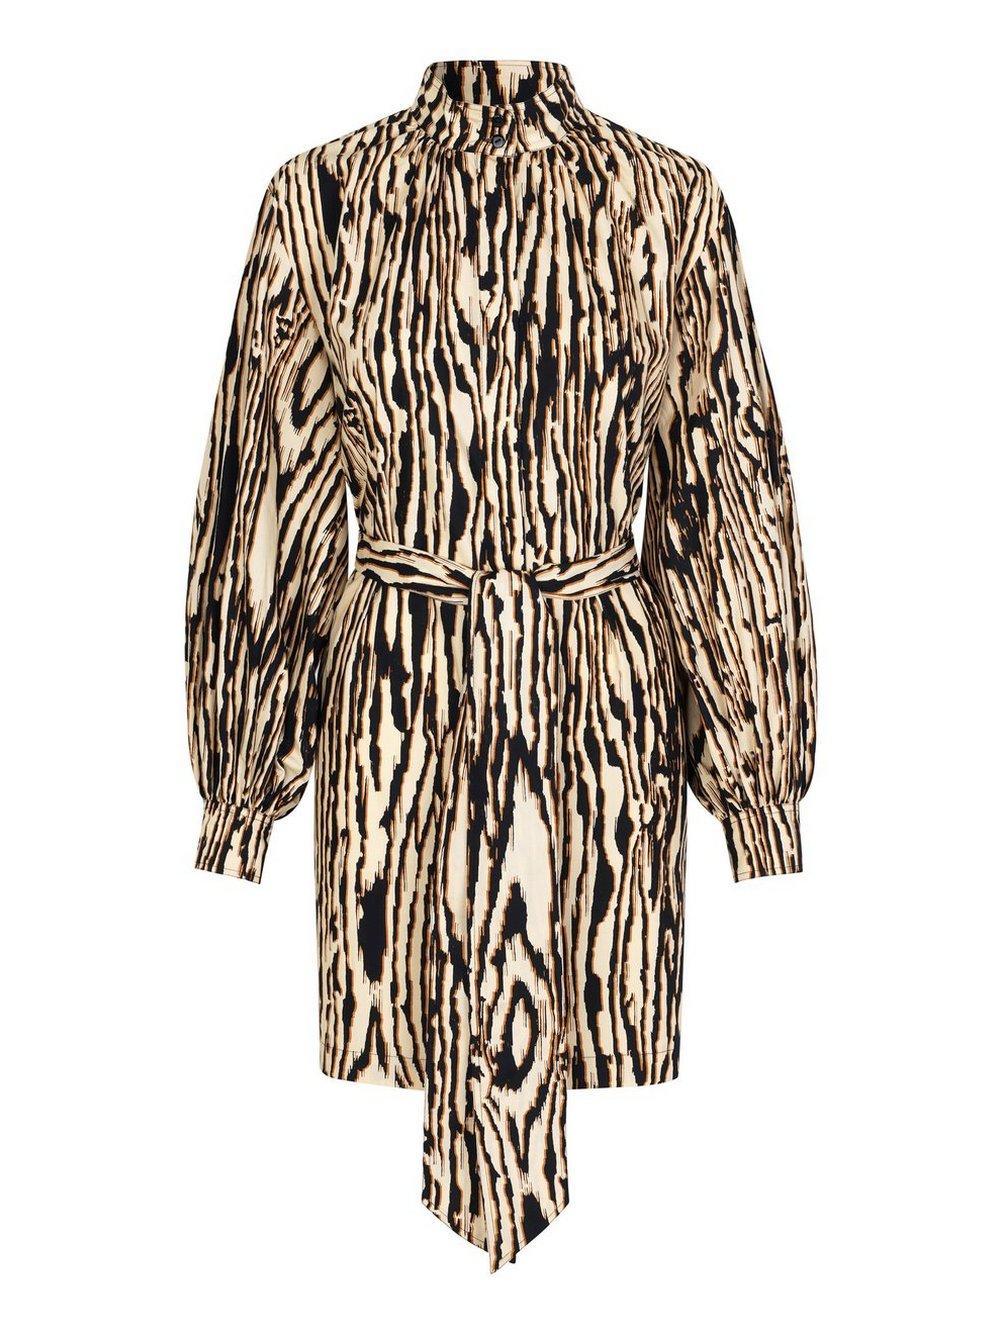 Apoline Shirt Dress Item # 21271